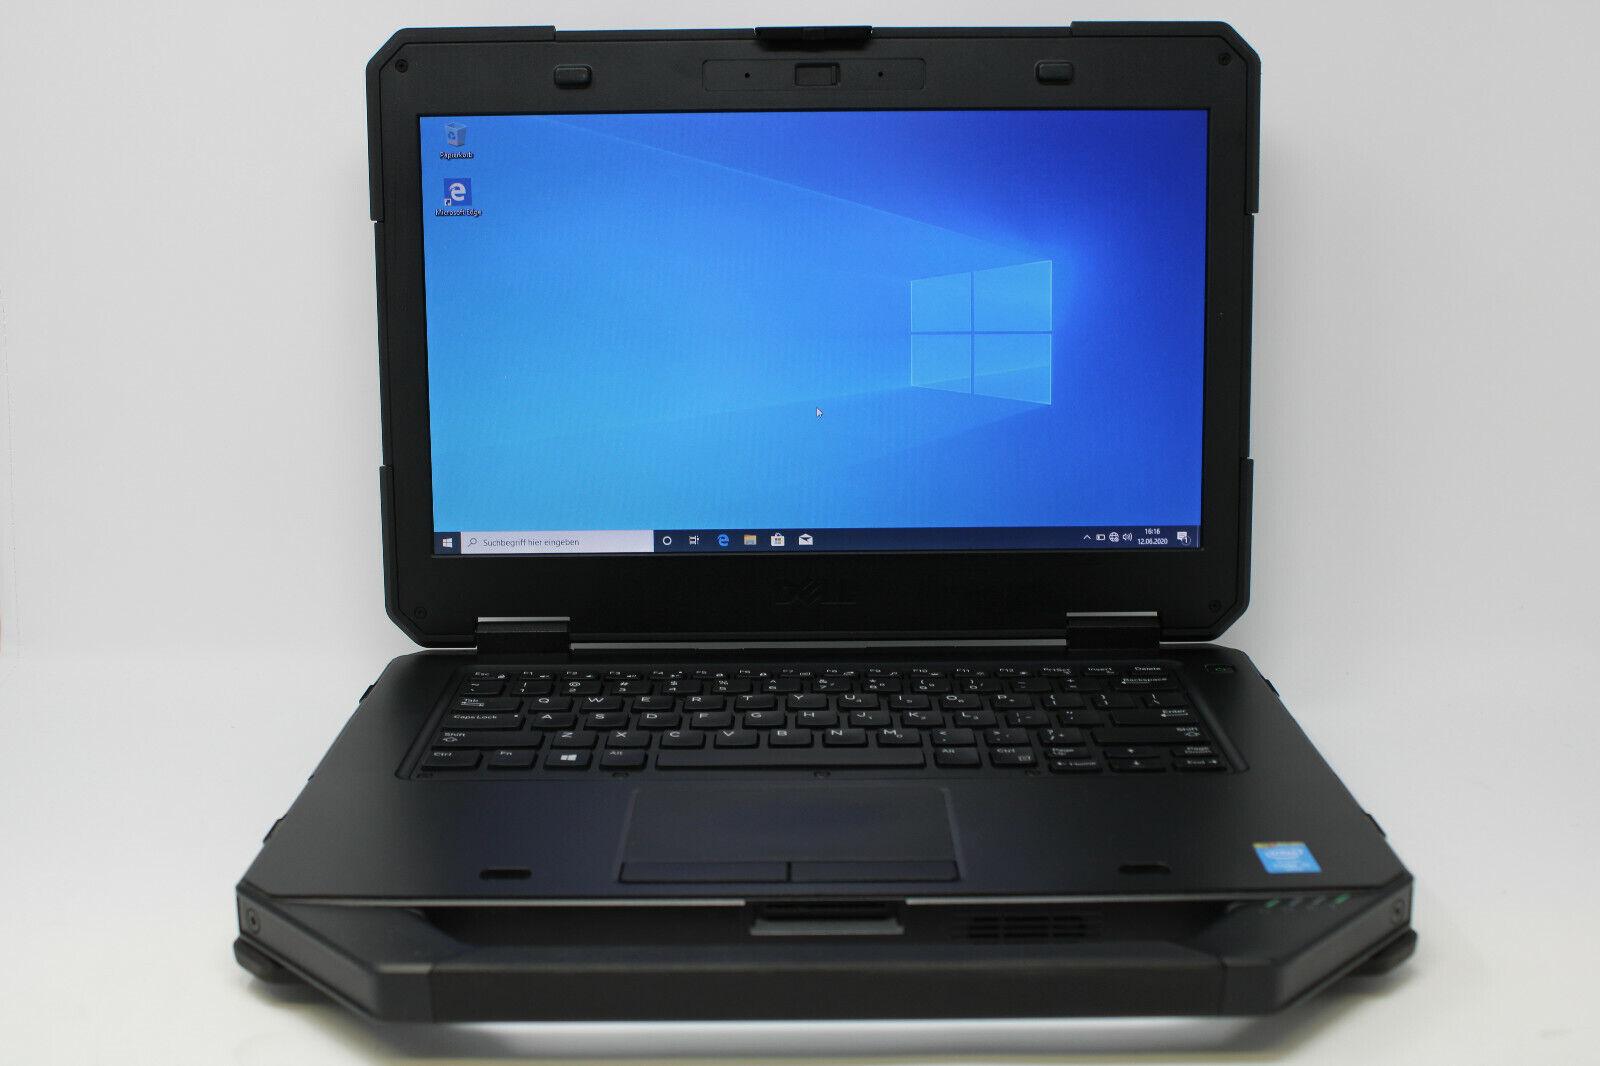 Dell Latitude 5404 Rugged Outdoor Notebook Core i5-4310 8GB 128GB SSD Win10